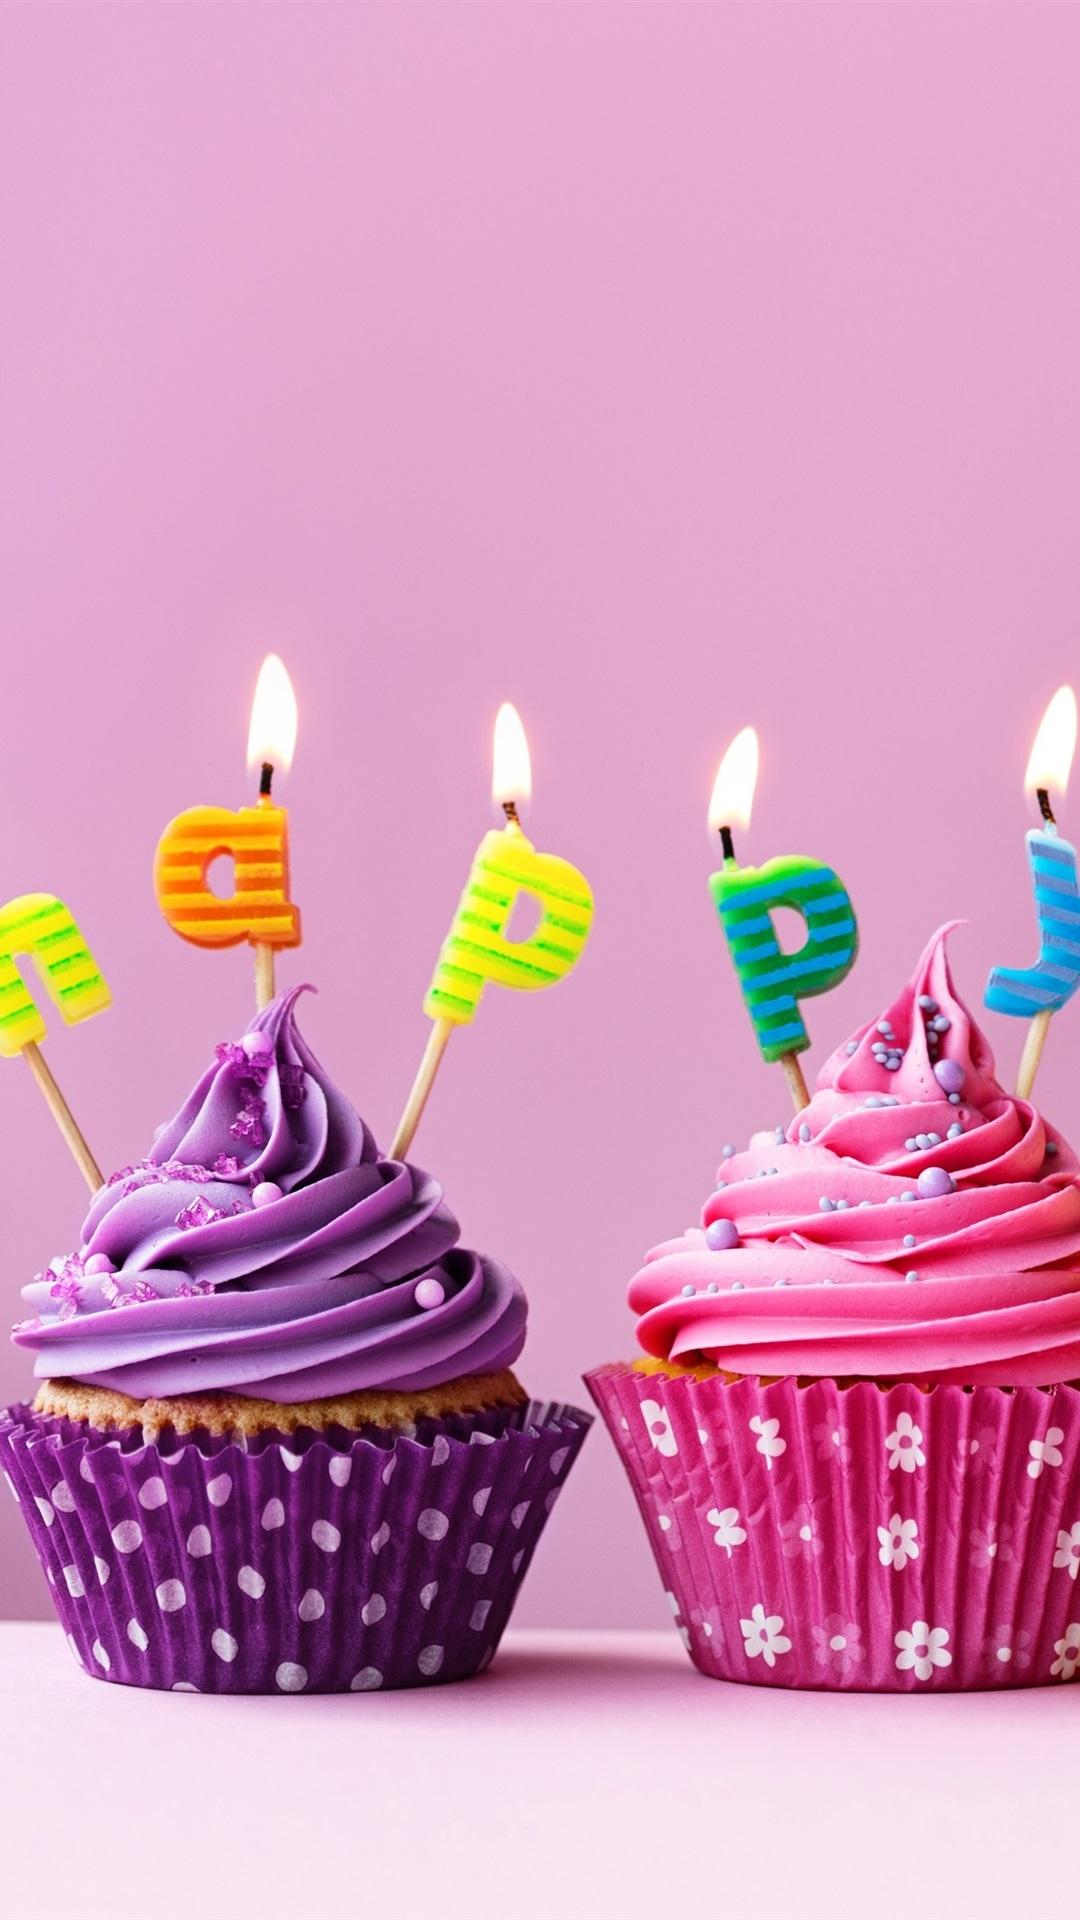 Картинки с днем рождения на айфон